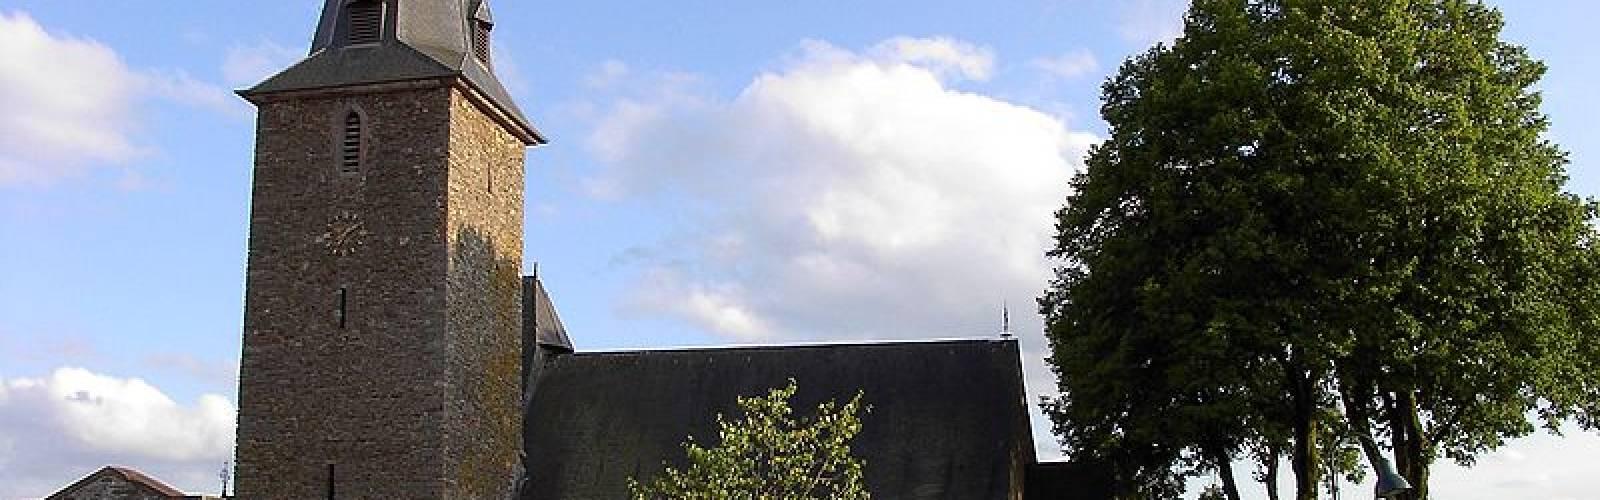 gotische kirche munshausen